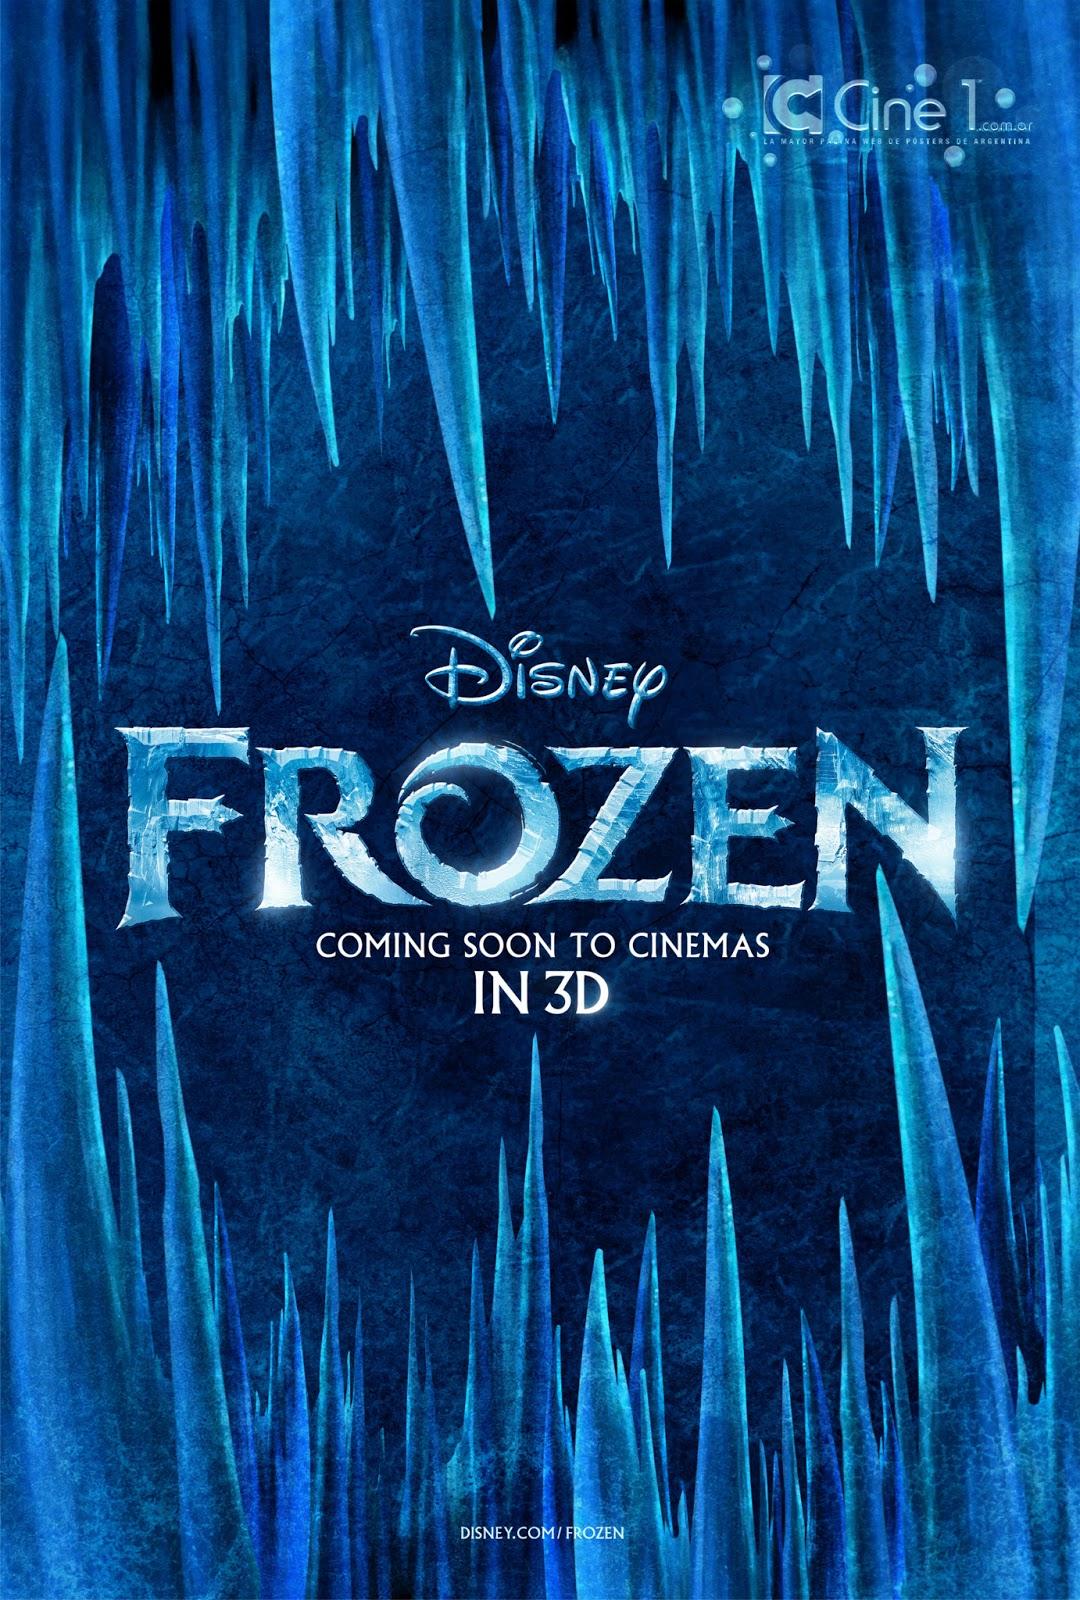 Upcoming Adaptation: Disney's Frozen